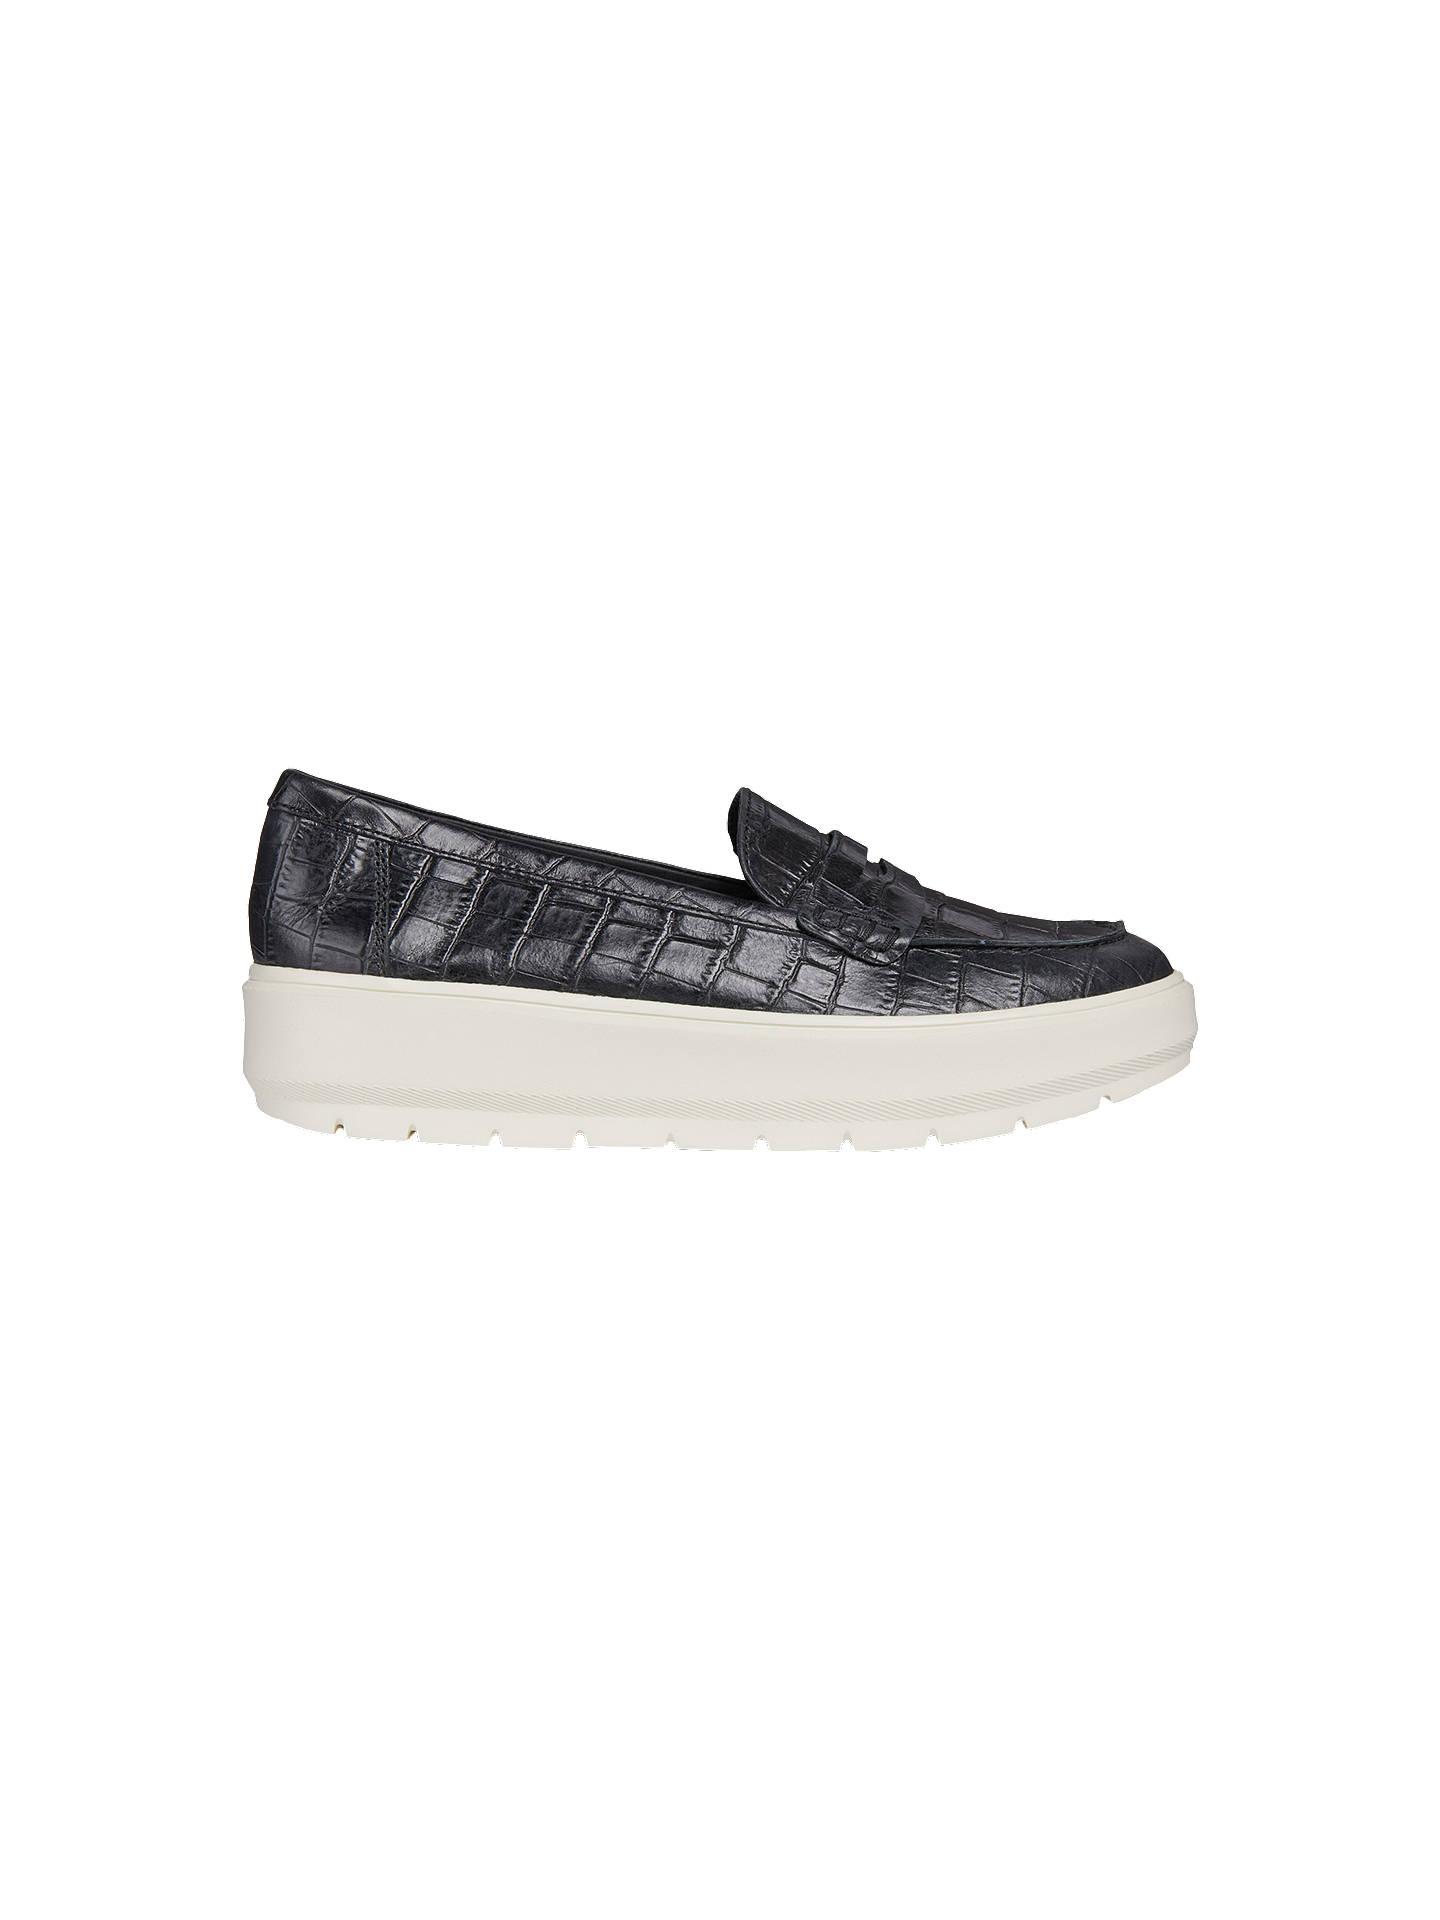 Ceder Integración usted está  Geox Kaula Slip On Flatform Loafers, Black Leather at John Lewis & Partners